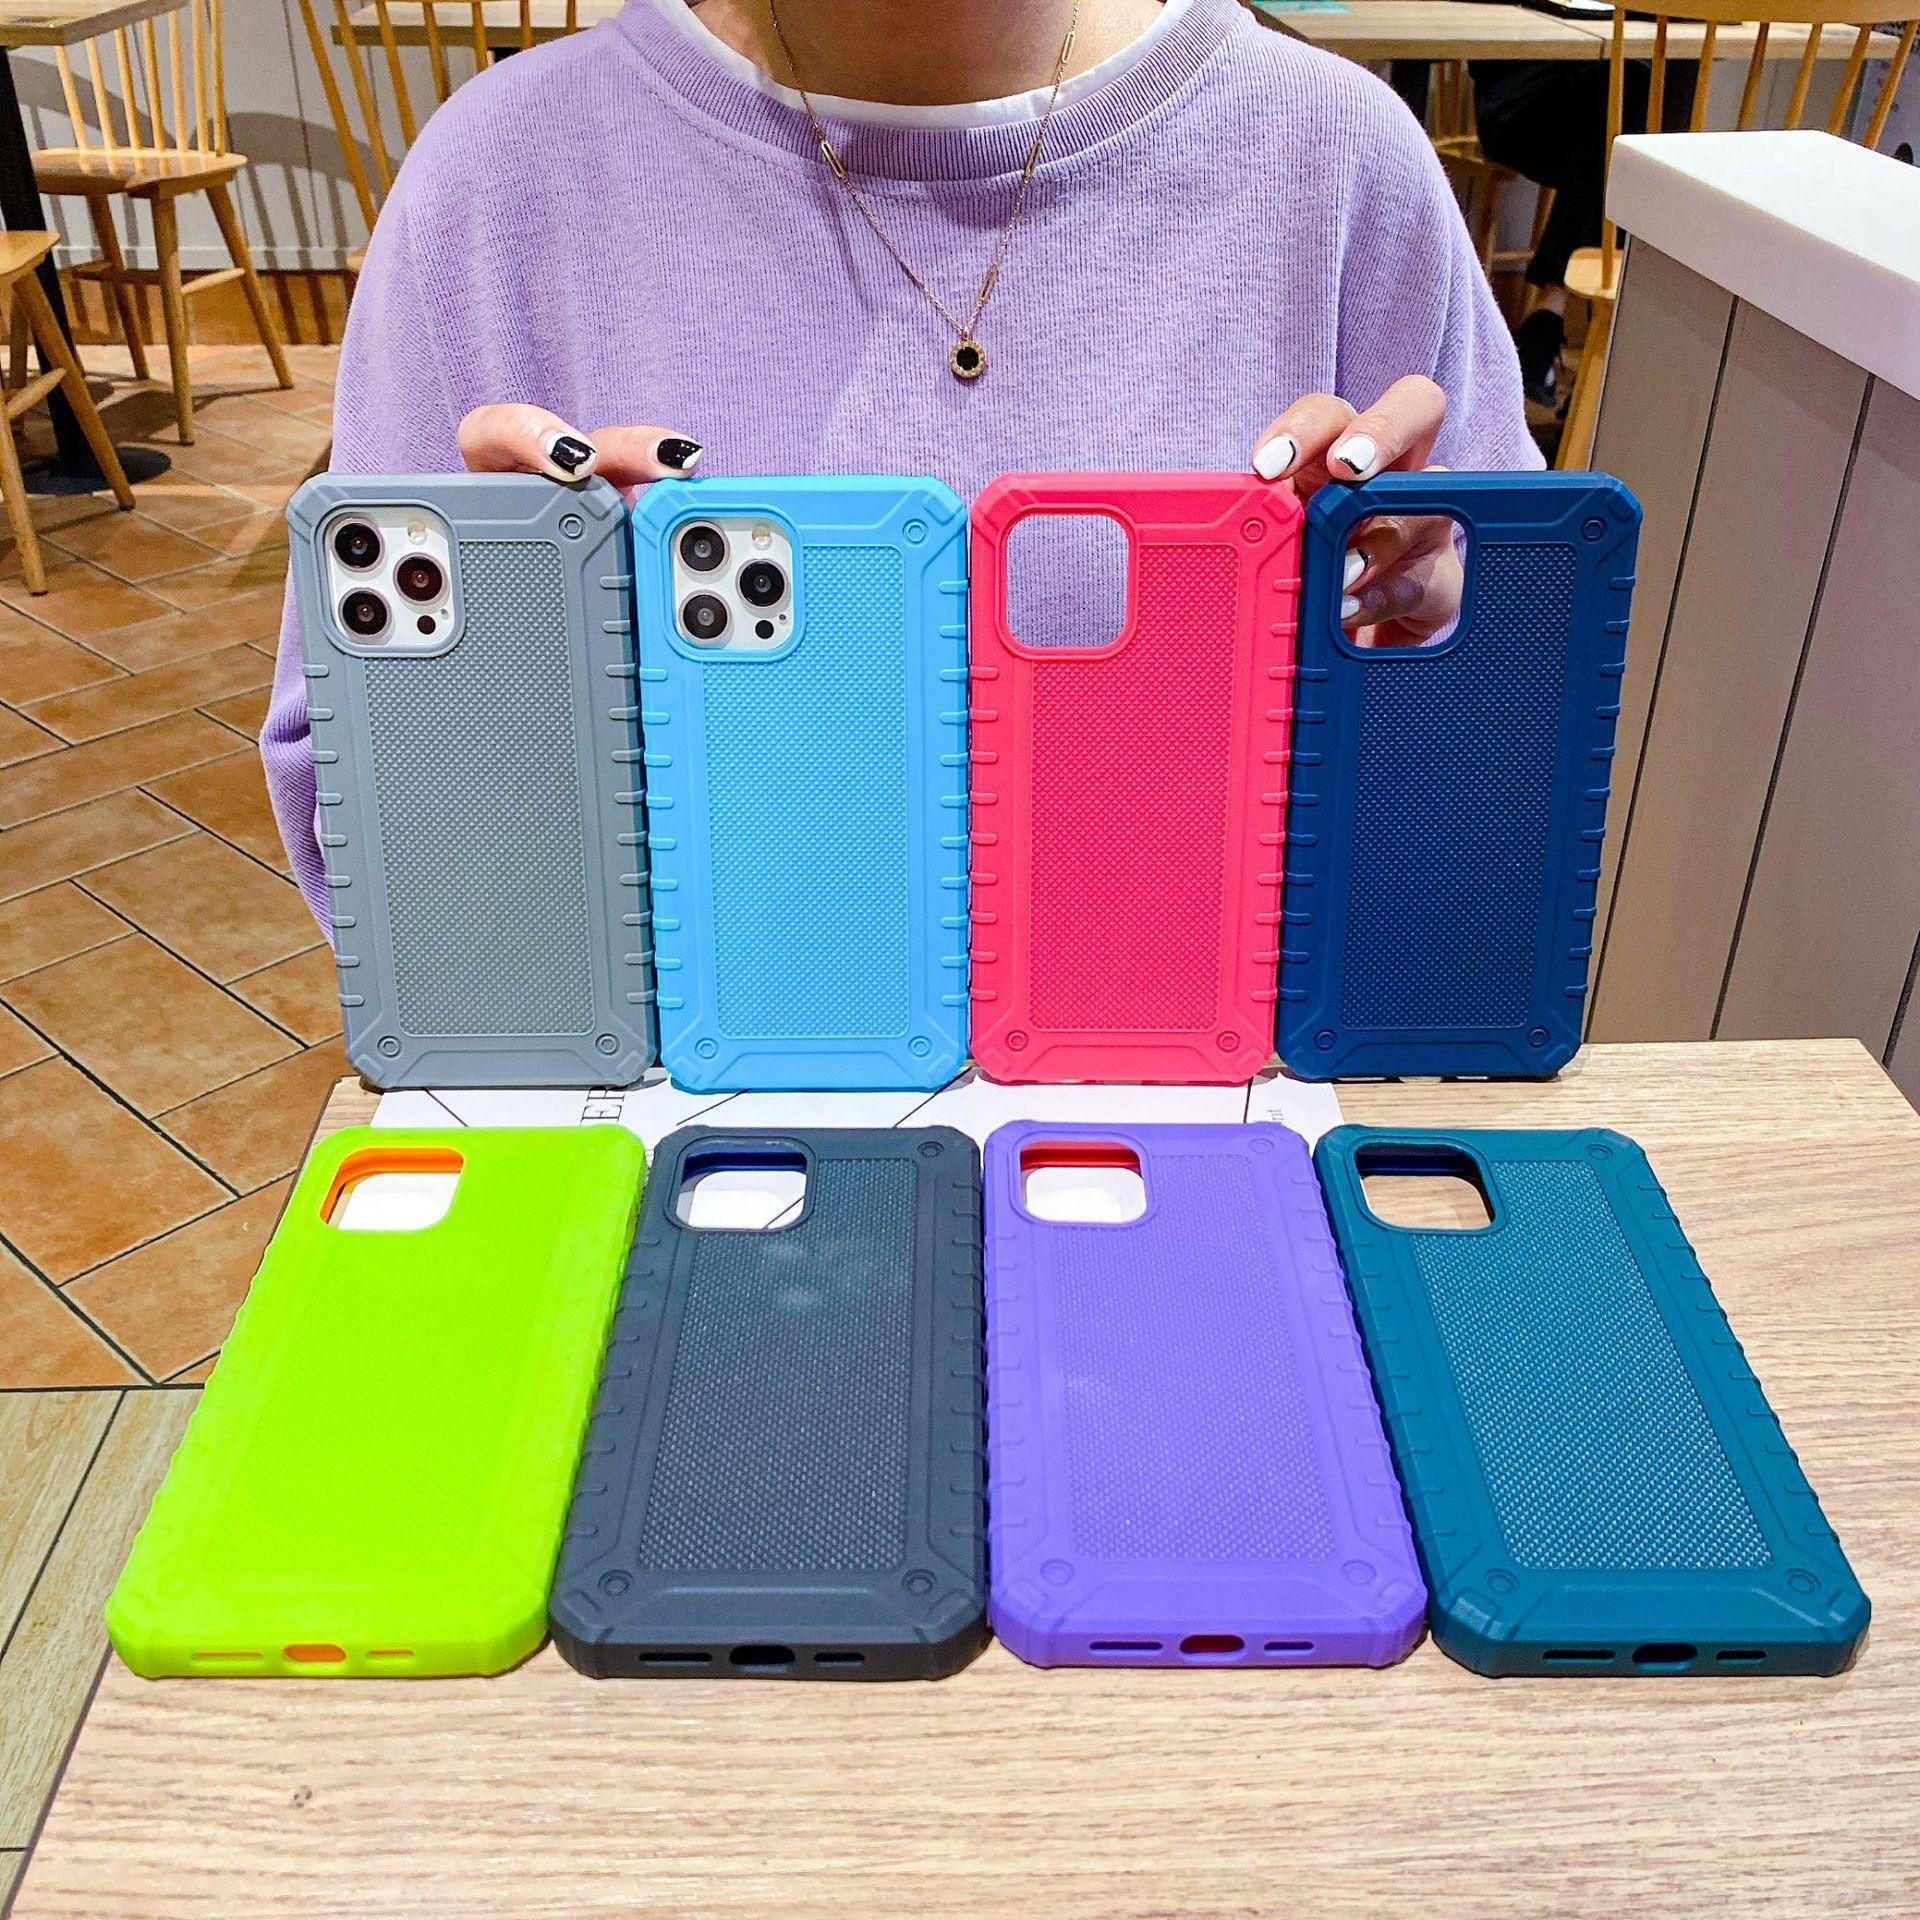 Mobiltelefonfälle Silikon für Apple iPhone 12Promax XR xs Zubehör Protector